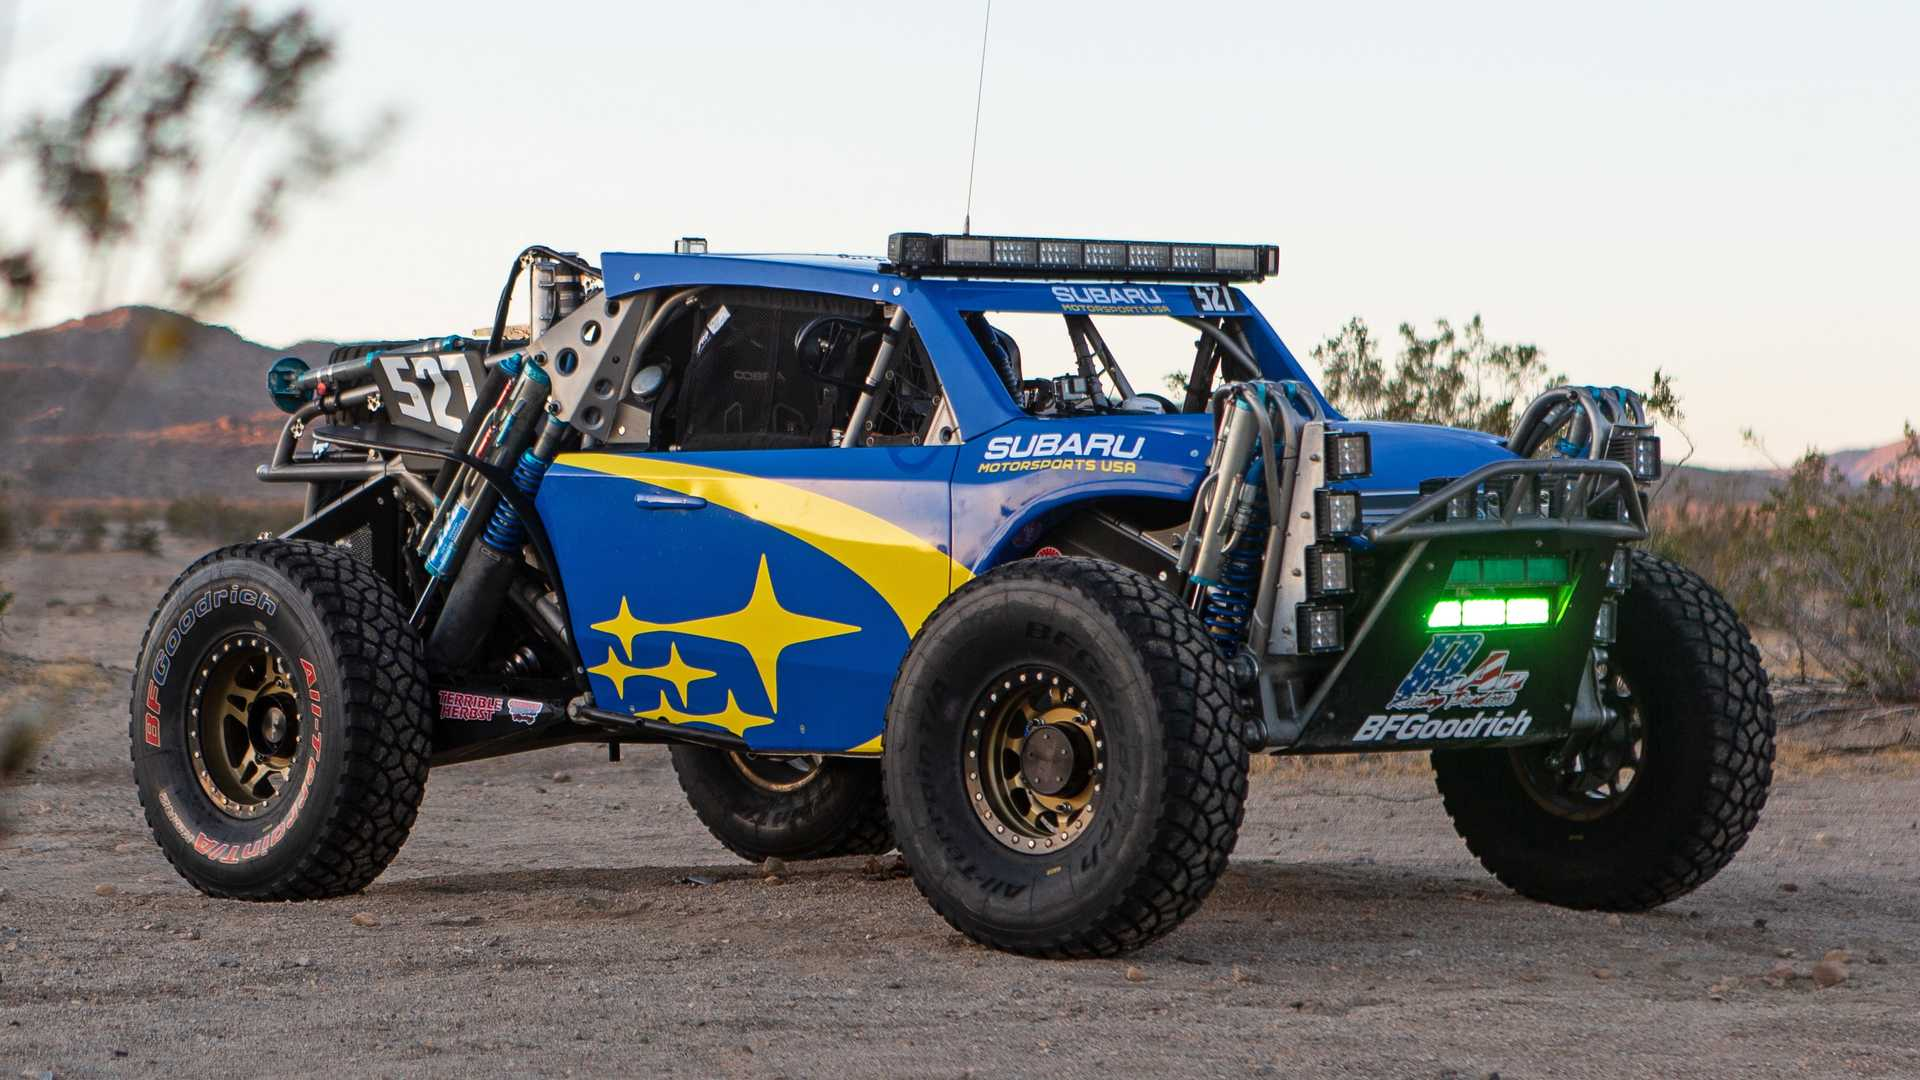 Subaru Crosstrek Off Road >> Subaru Crosstrek Desert Racer Looks Ready To Beat Baja